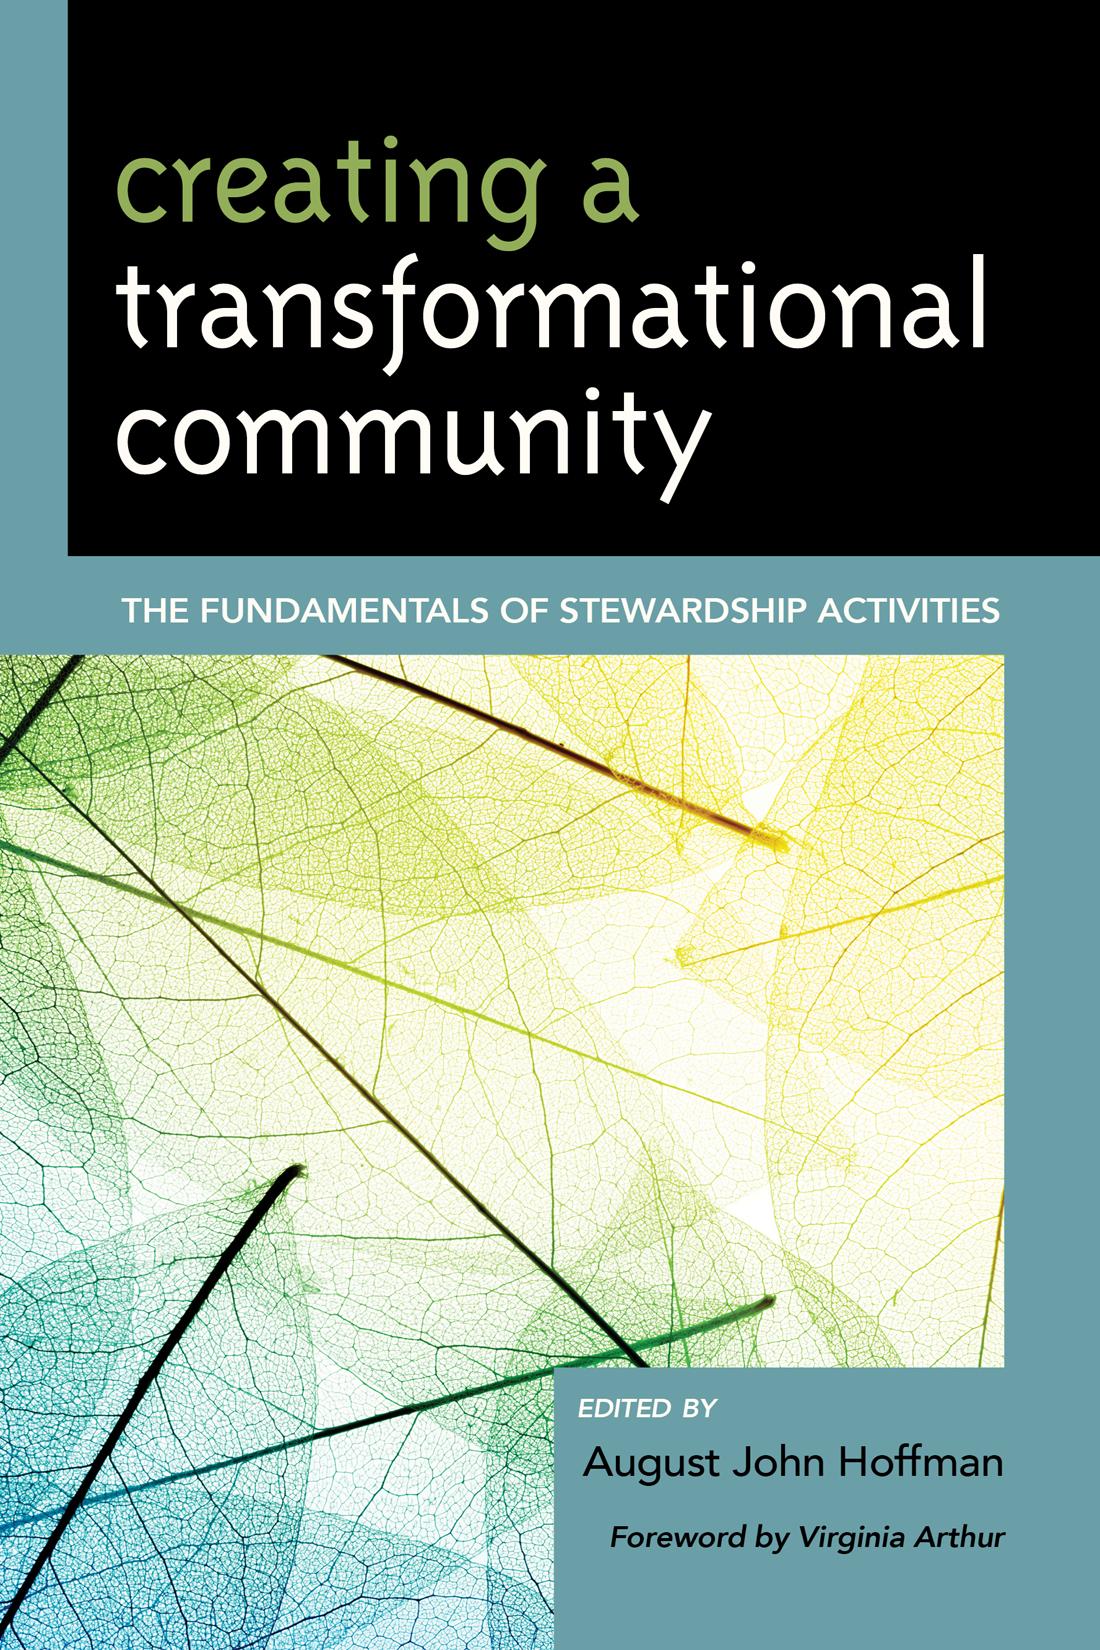 Creating a Transformational Community